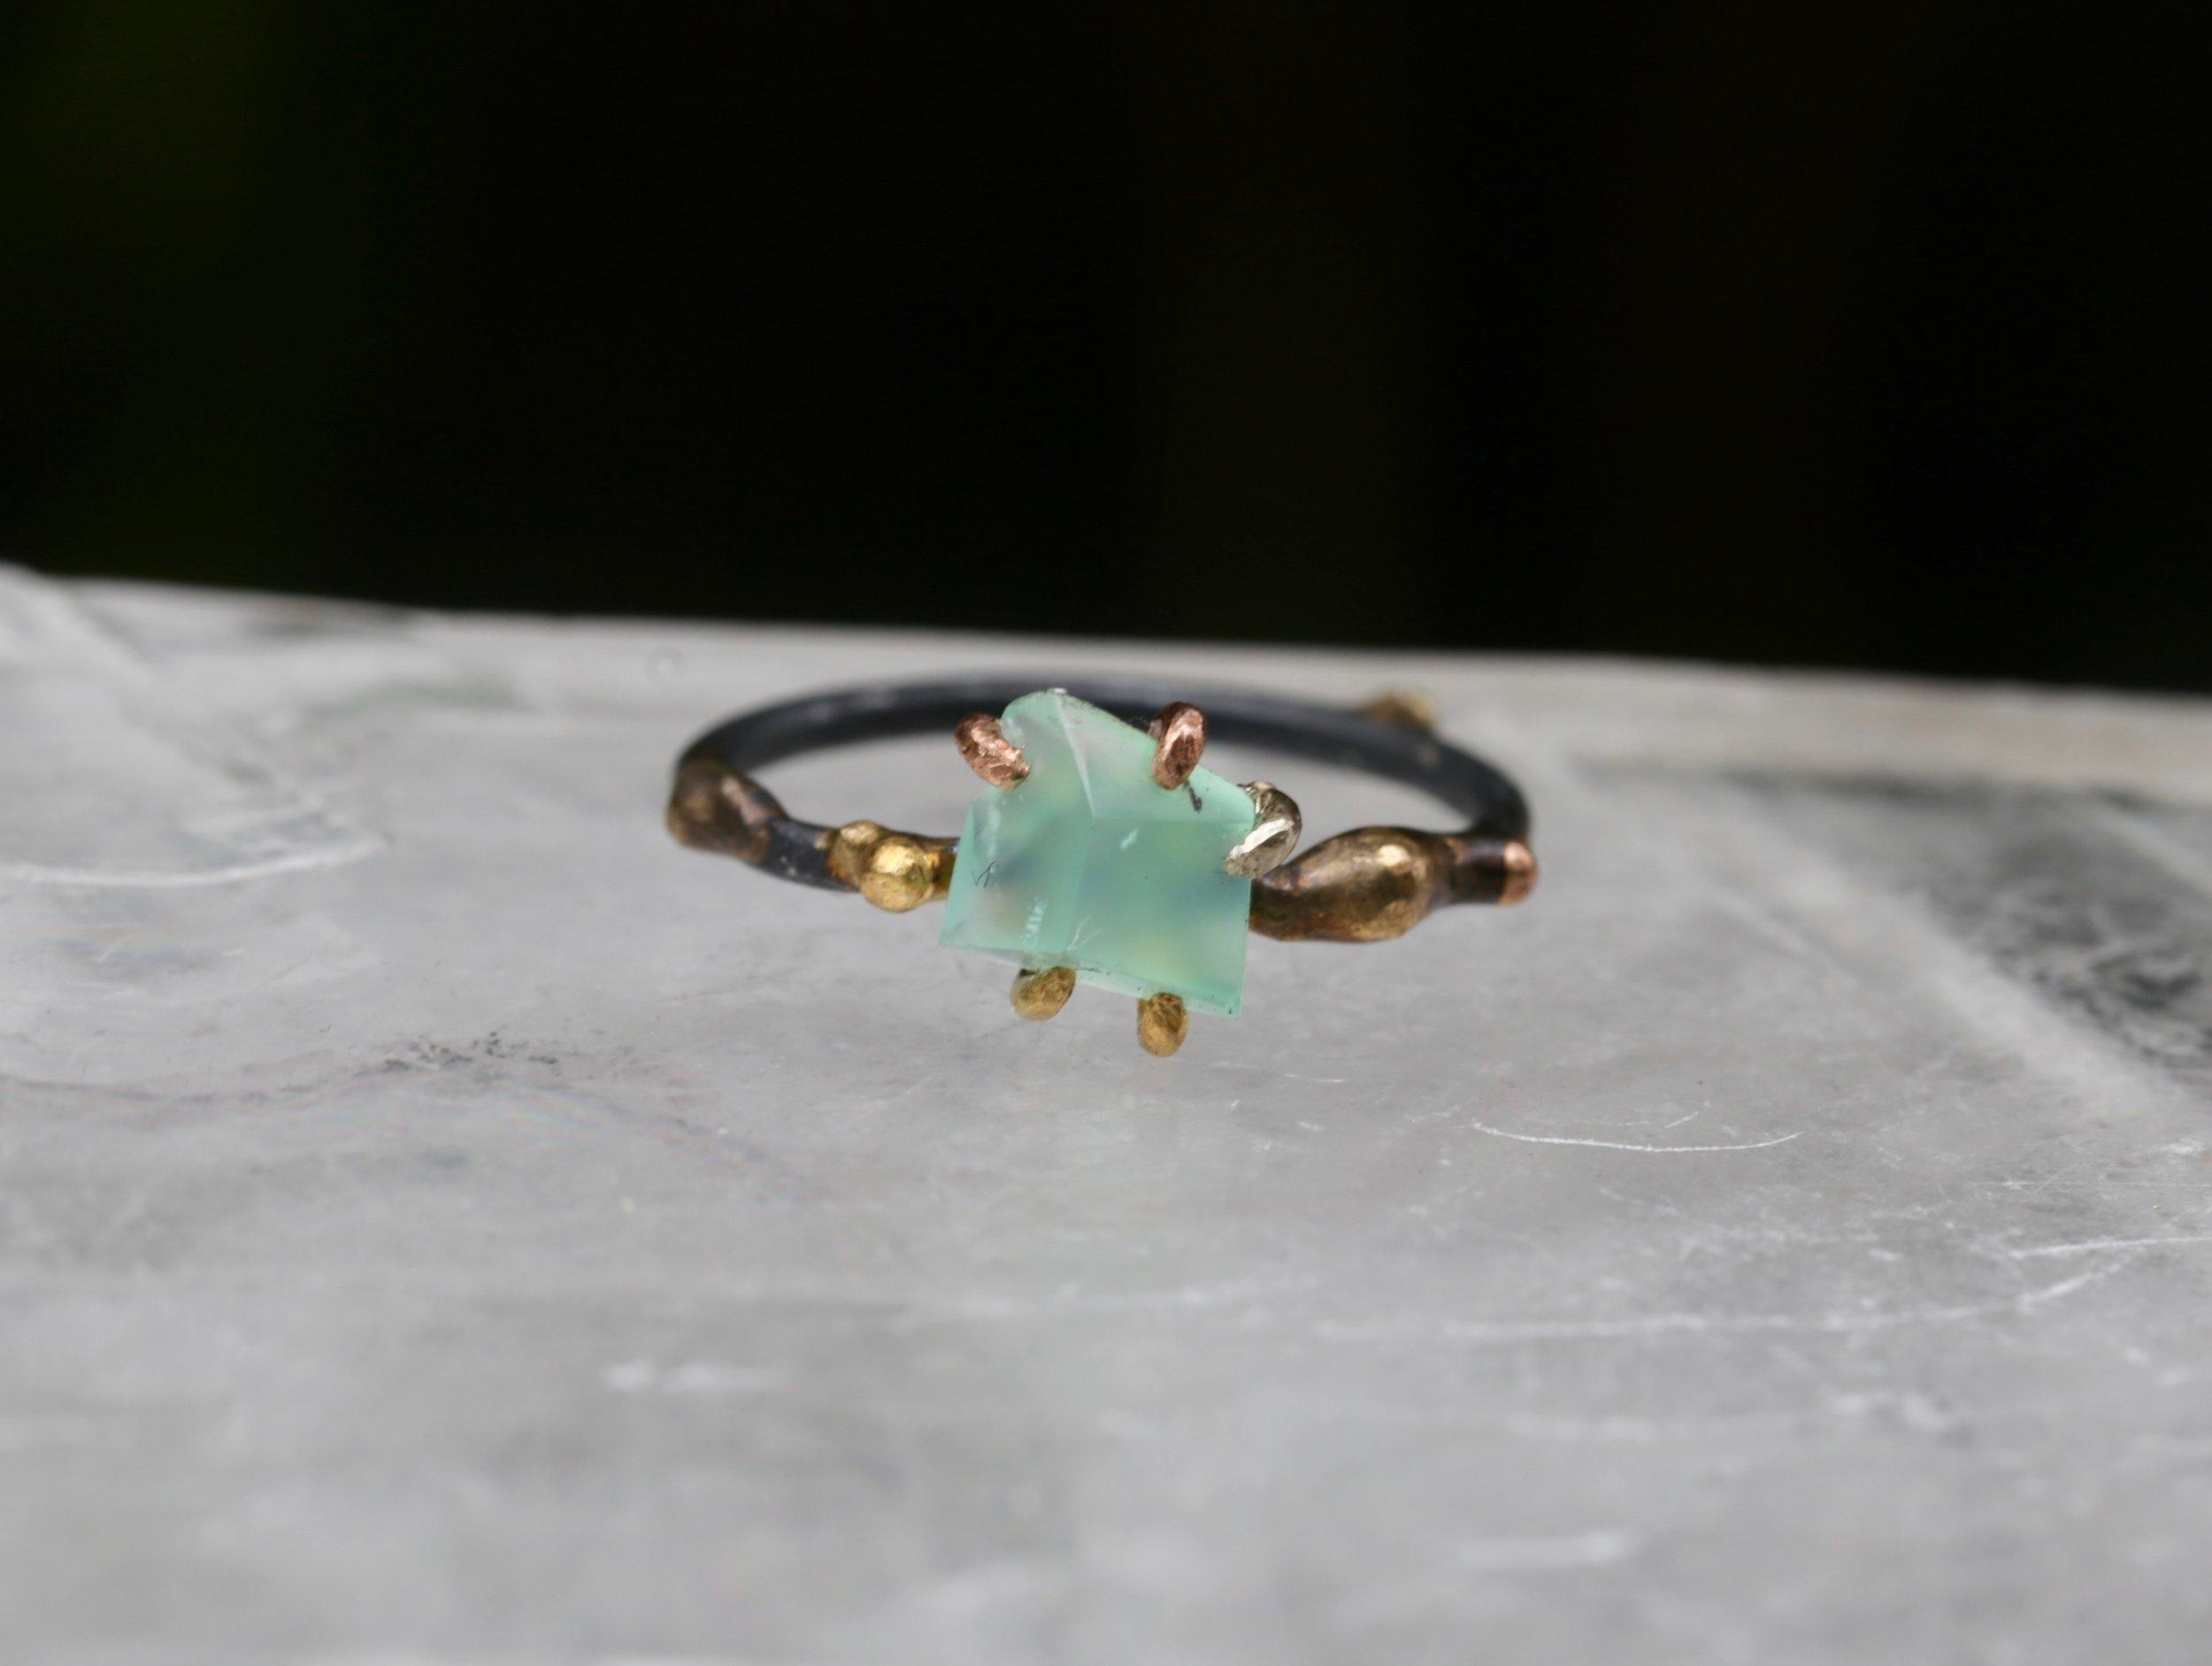 chrysoprase+small+ring+8.18.19.jpeg